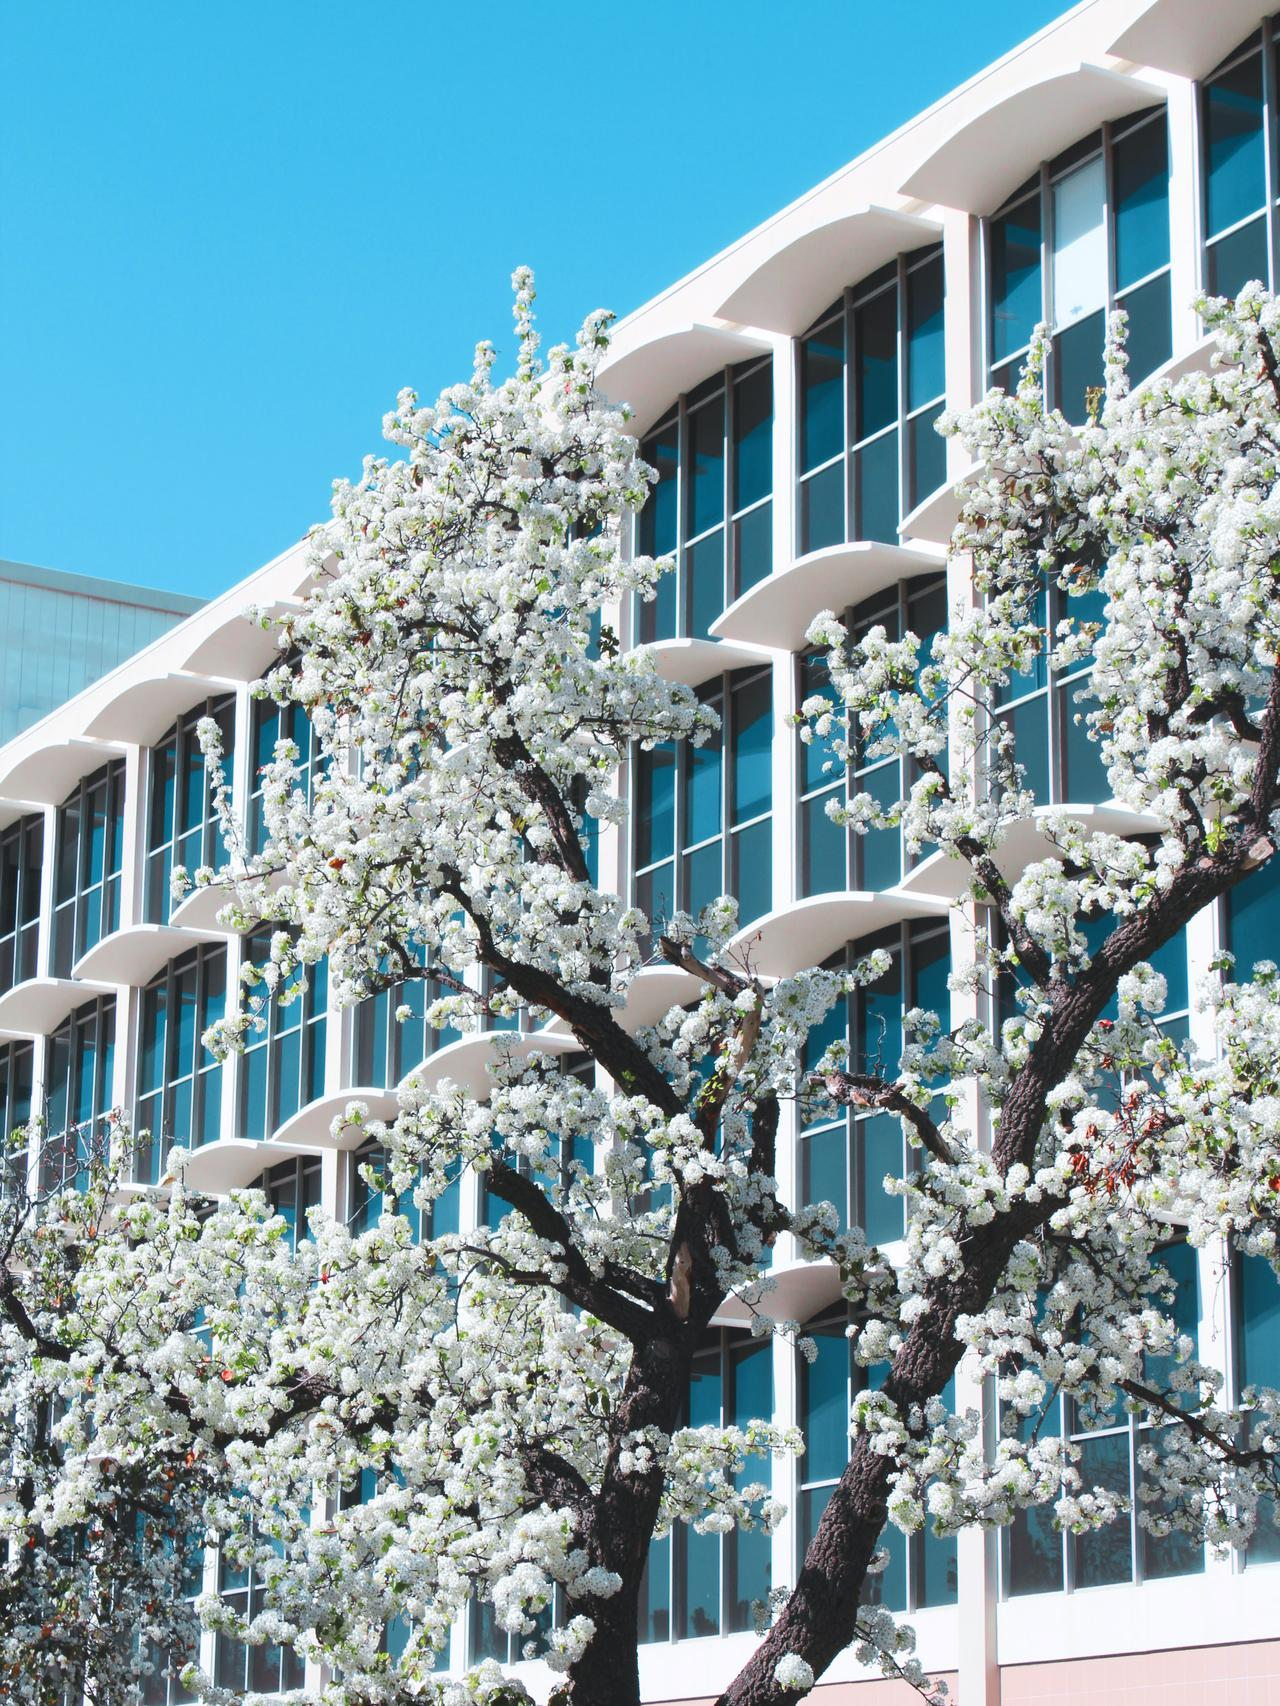 Stay in luxury apartments near UCLA as a dorm alternative